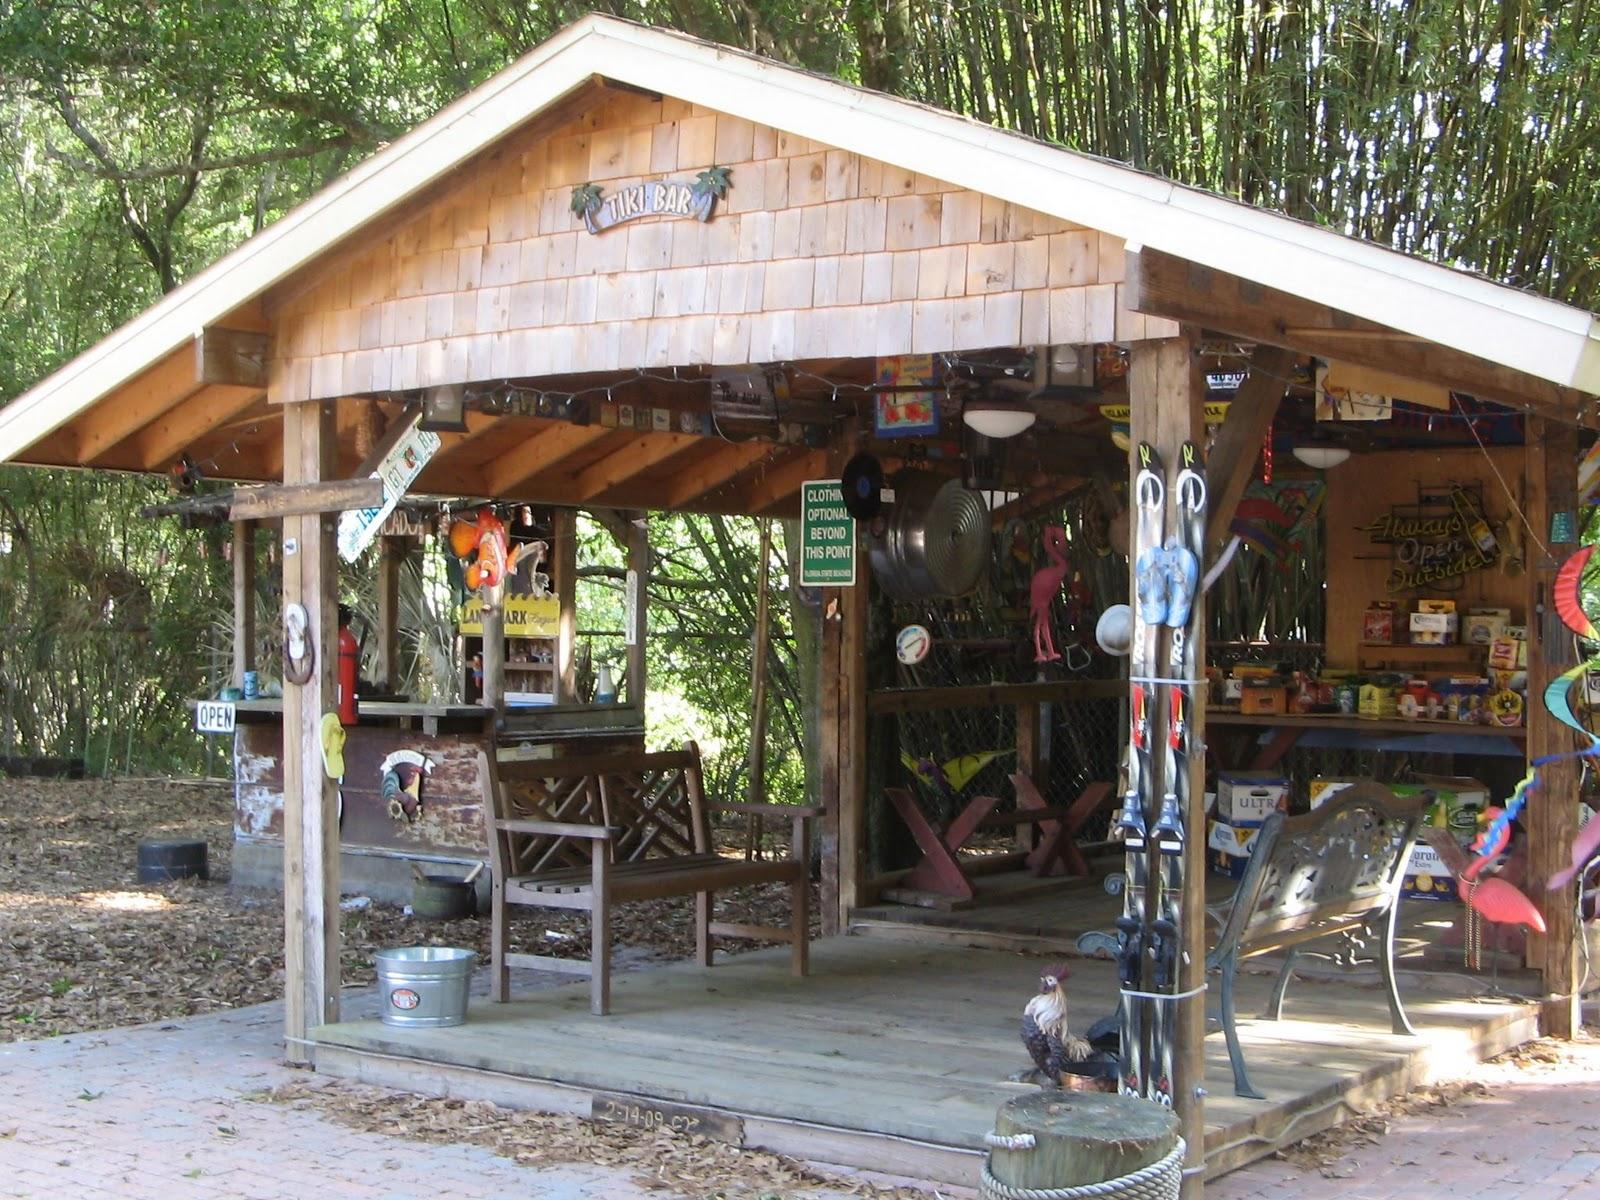 Beaches, Bands & Bars: 2011-10-09 on Tiki Bar Designs For Backyard id=77286